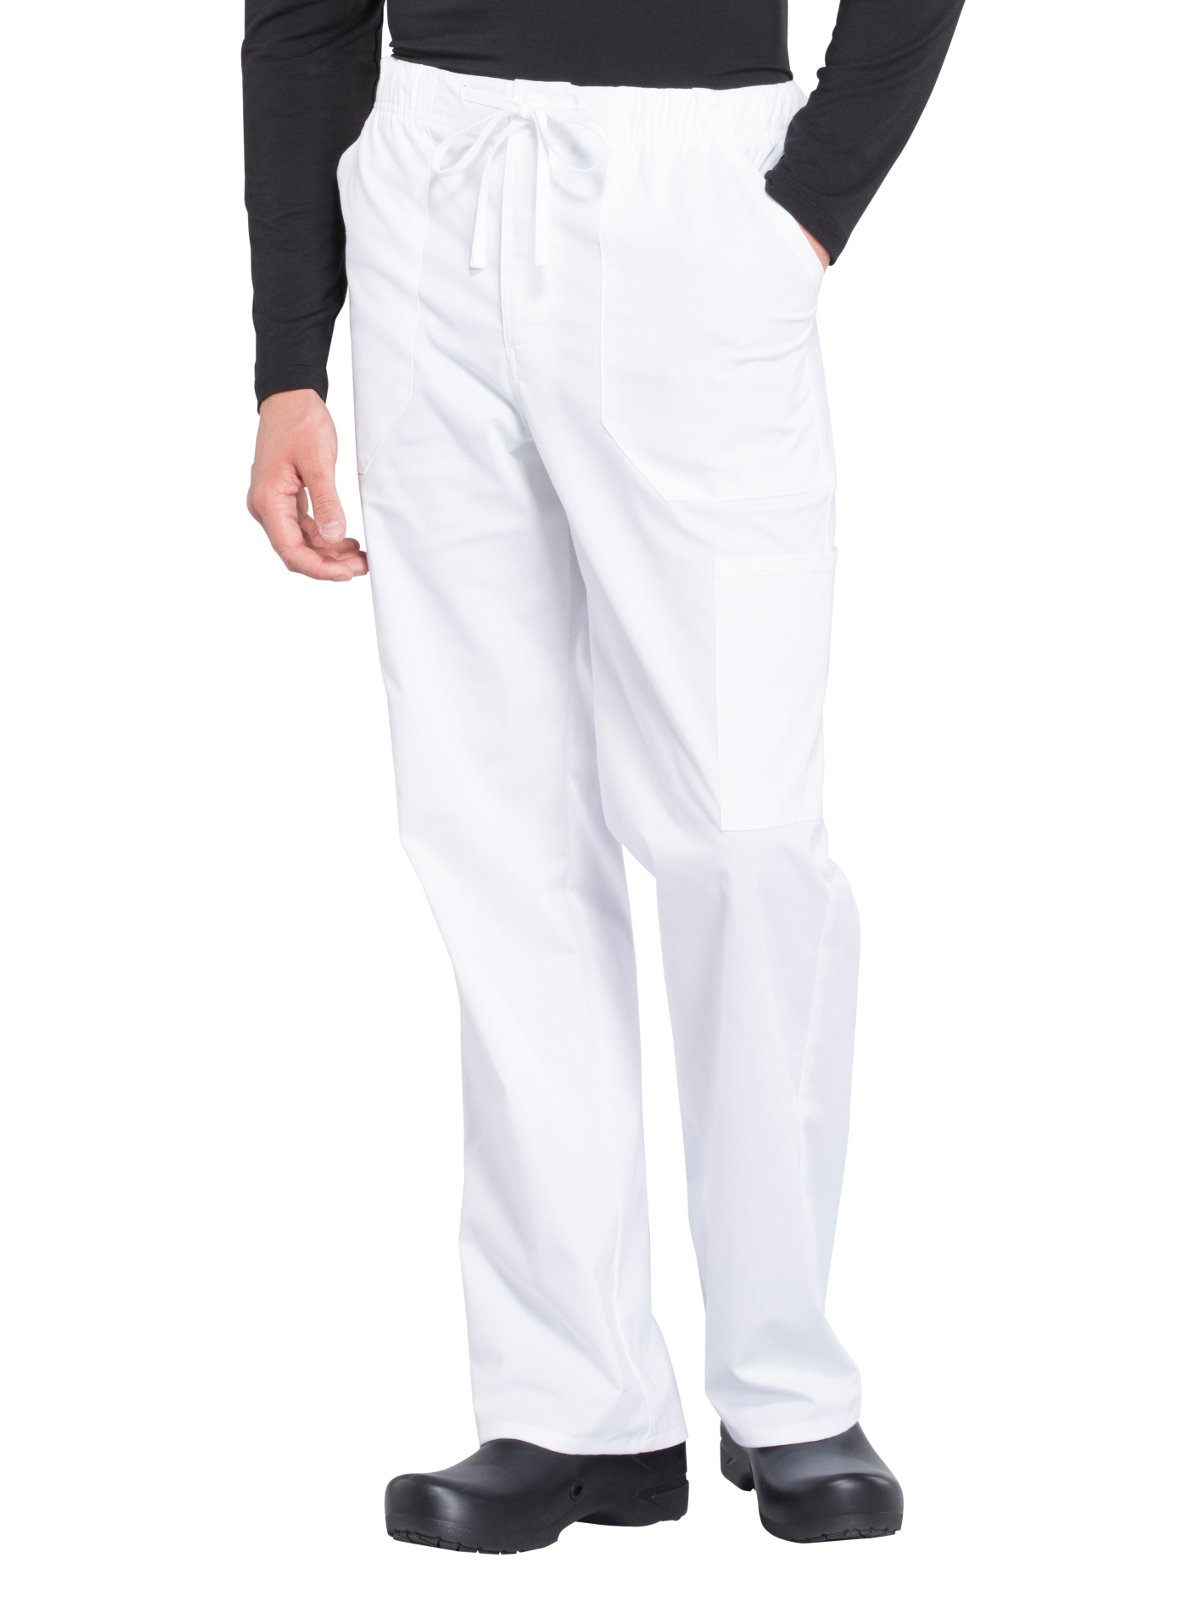 Cherokee Professionals Workwear Men's Tapered Leg Zip Fly Drawstring Scrub Pant Medium Tall White